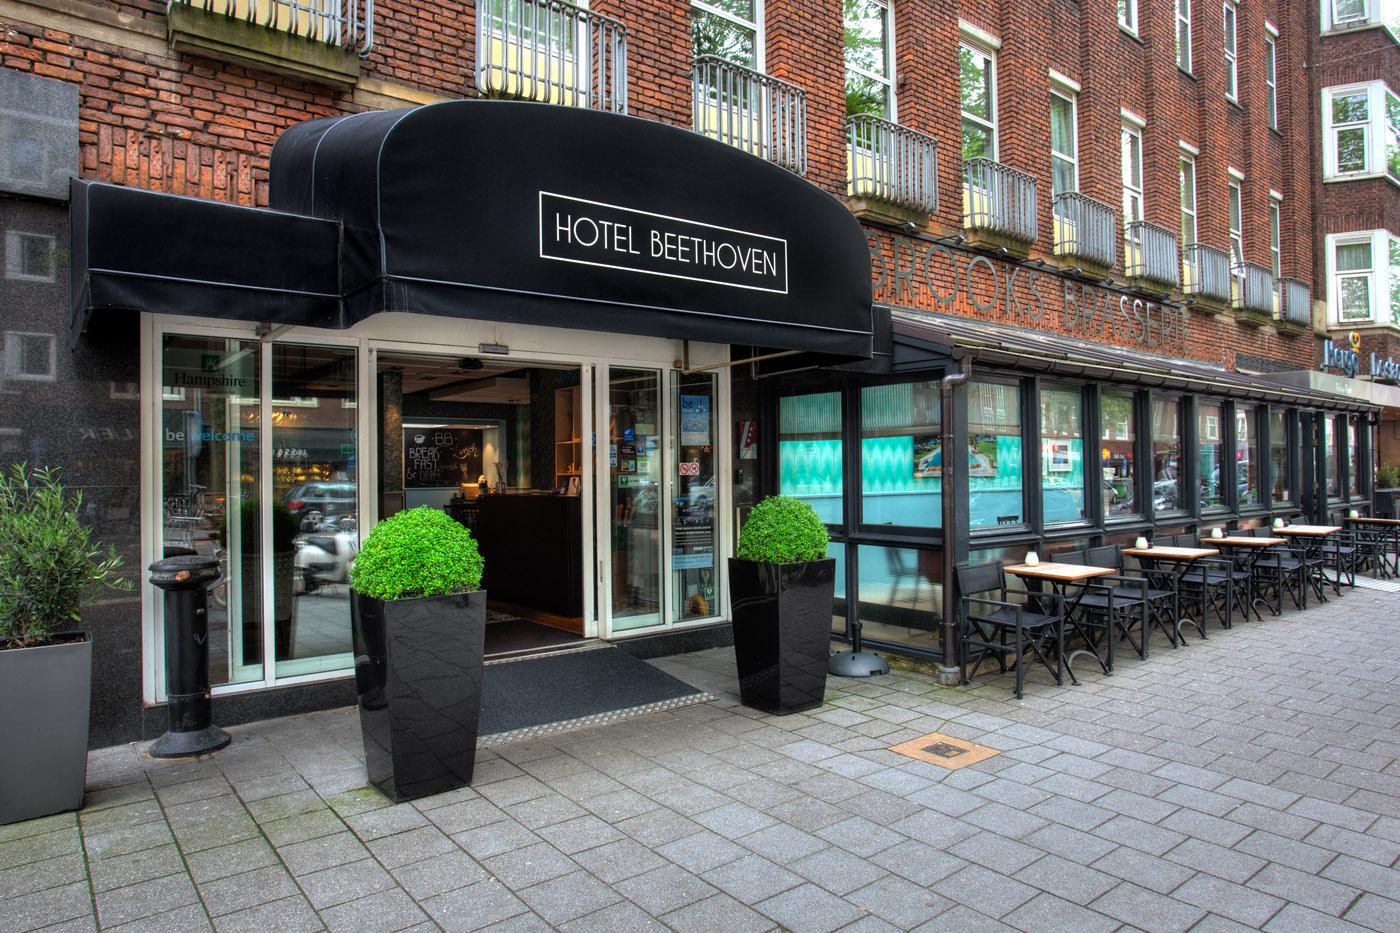 Hampshire hotel beethoven